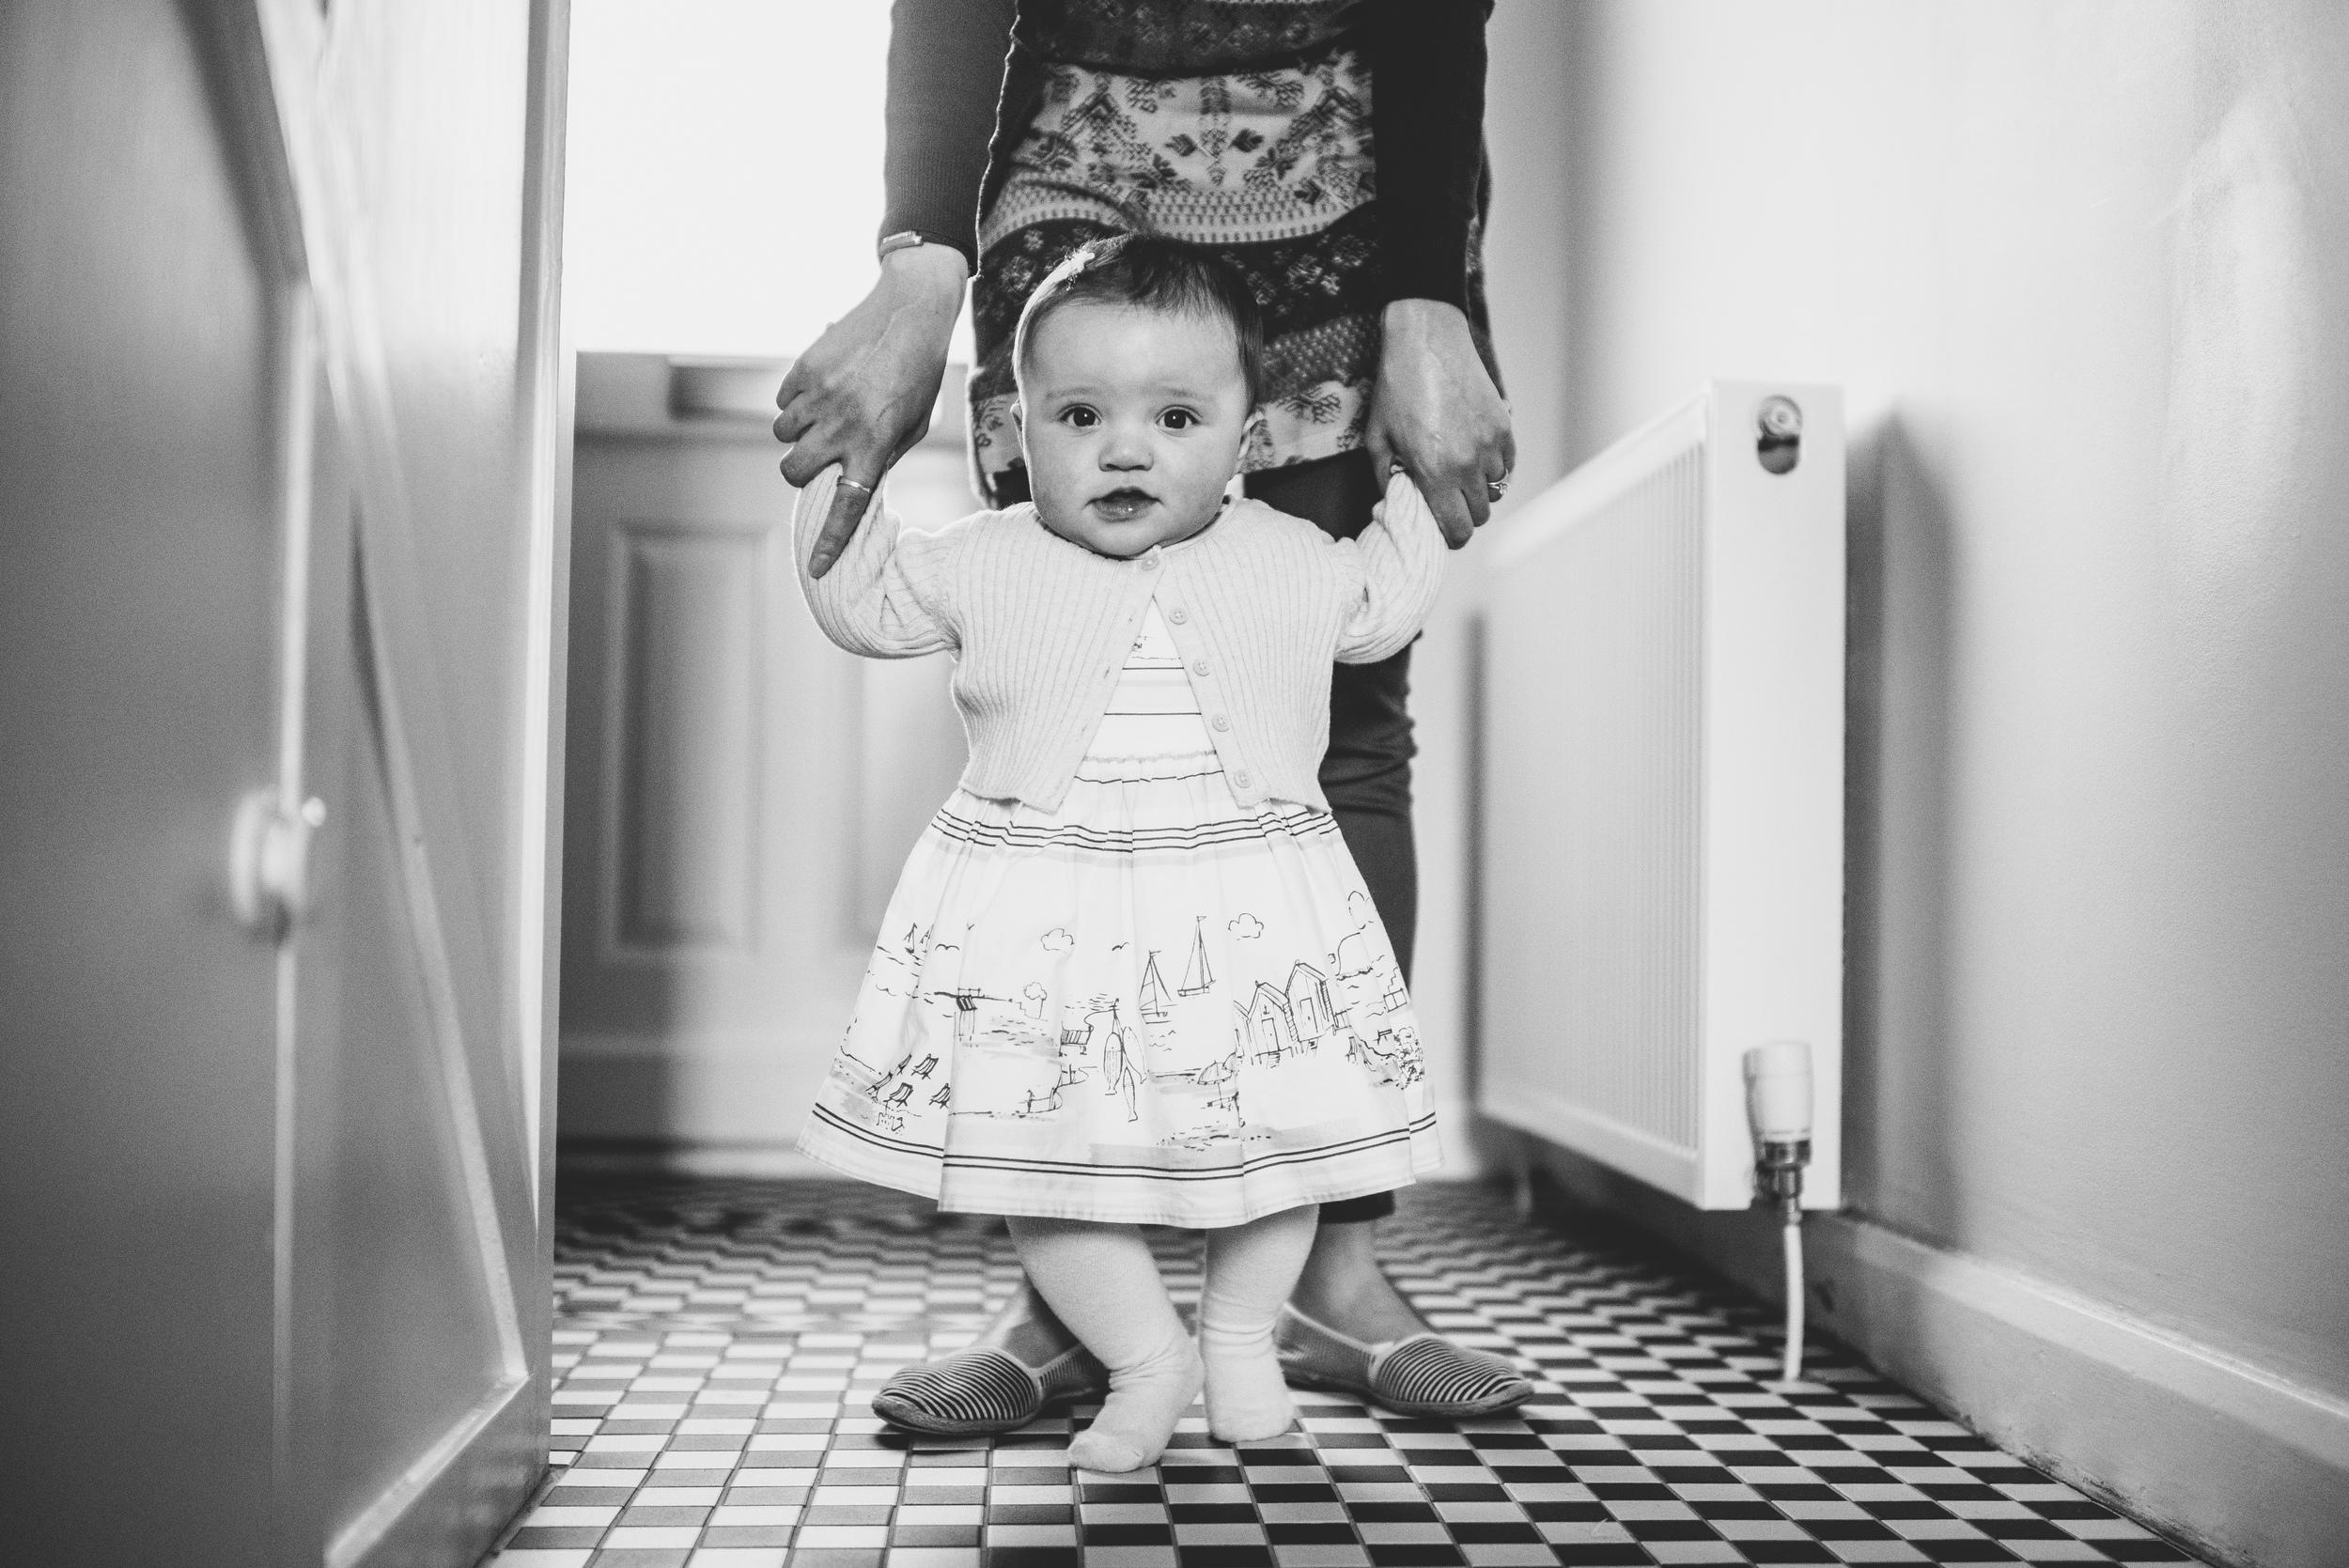 0041-ALTERNATIVE-WEDDING-PHOTOGRAPHER-GLASGOW-FAMILY-PHOTOGRAPHER-KIDS-PORTRAITS-BABY-PORTRAITS-GLASGOW.JPG